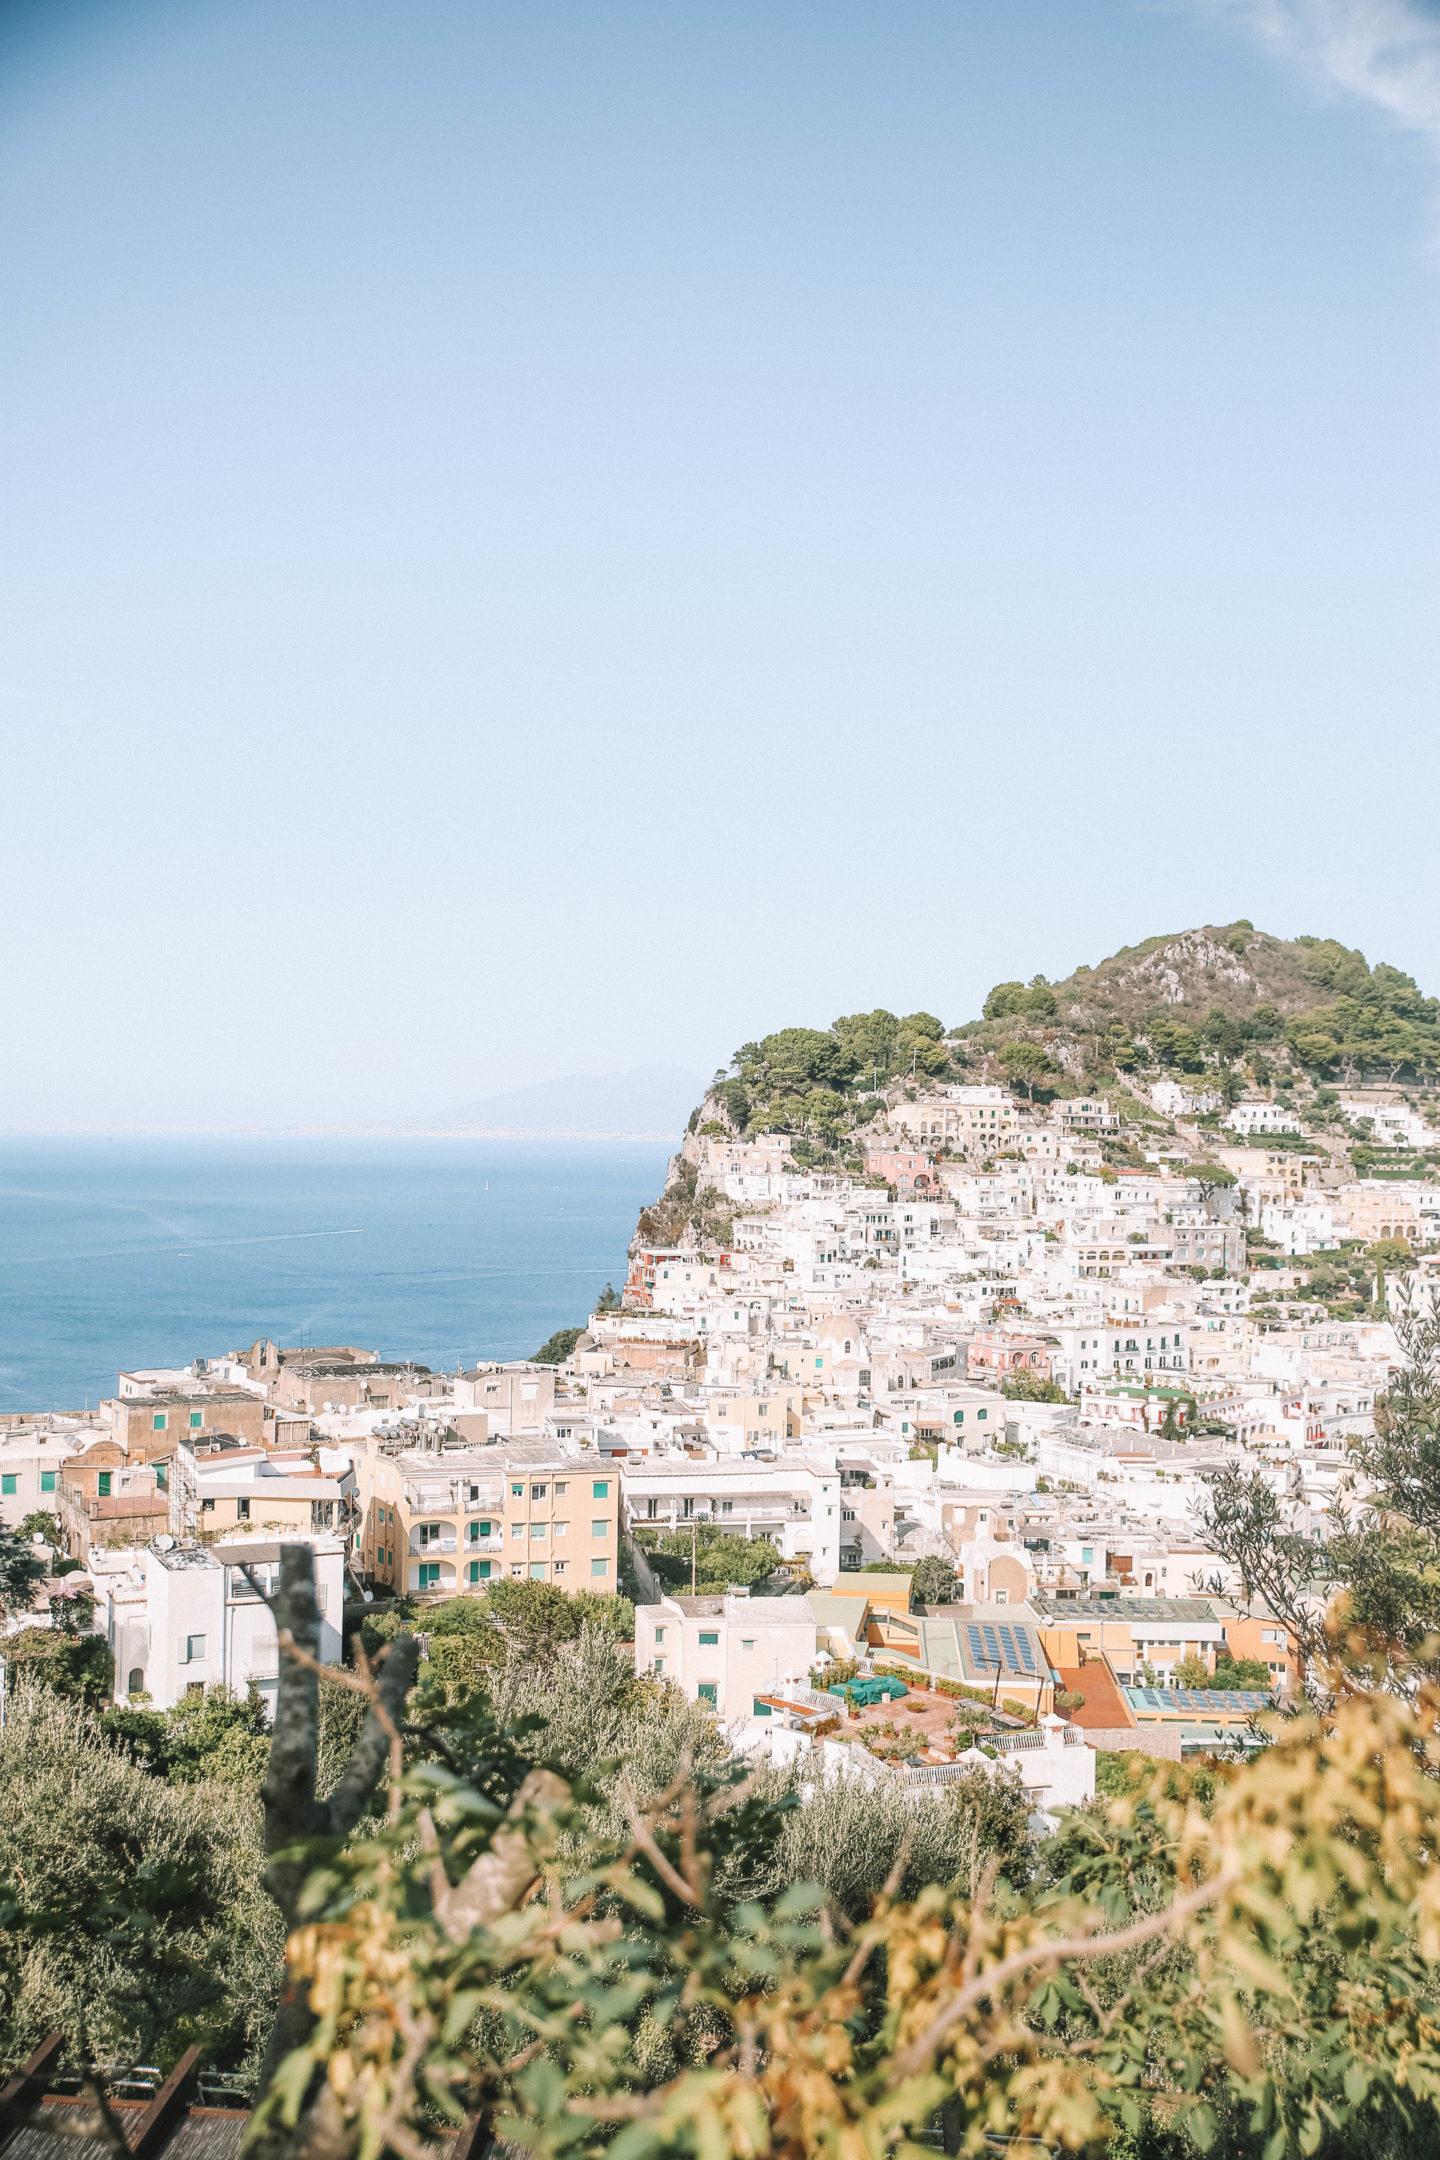 Vue de Capri Italie - Blondie baby blog mode et voyages